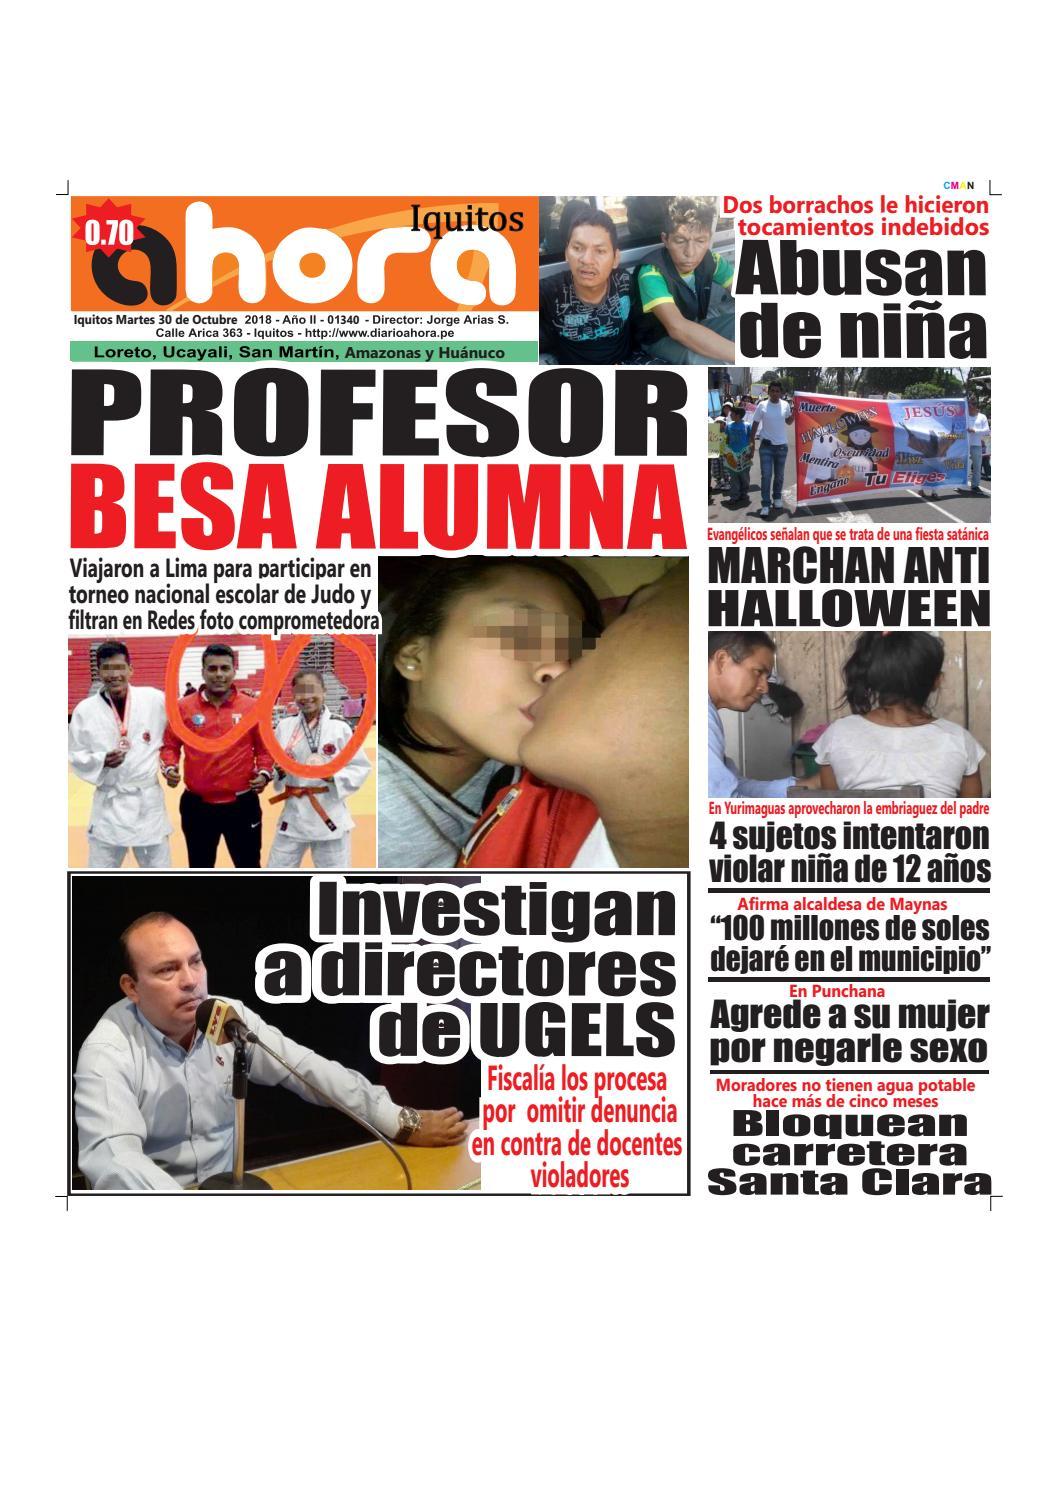 Alcaldesa Follando iquitos 30 de octubre del 2018jonatan arias - issuu